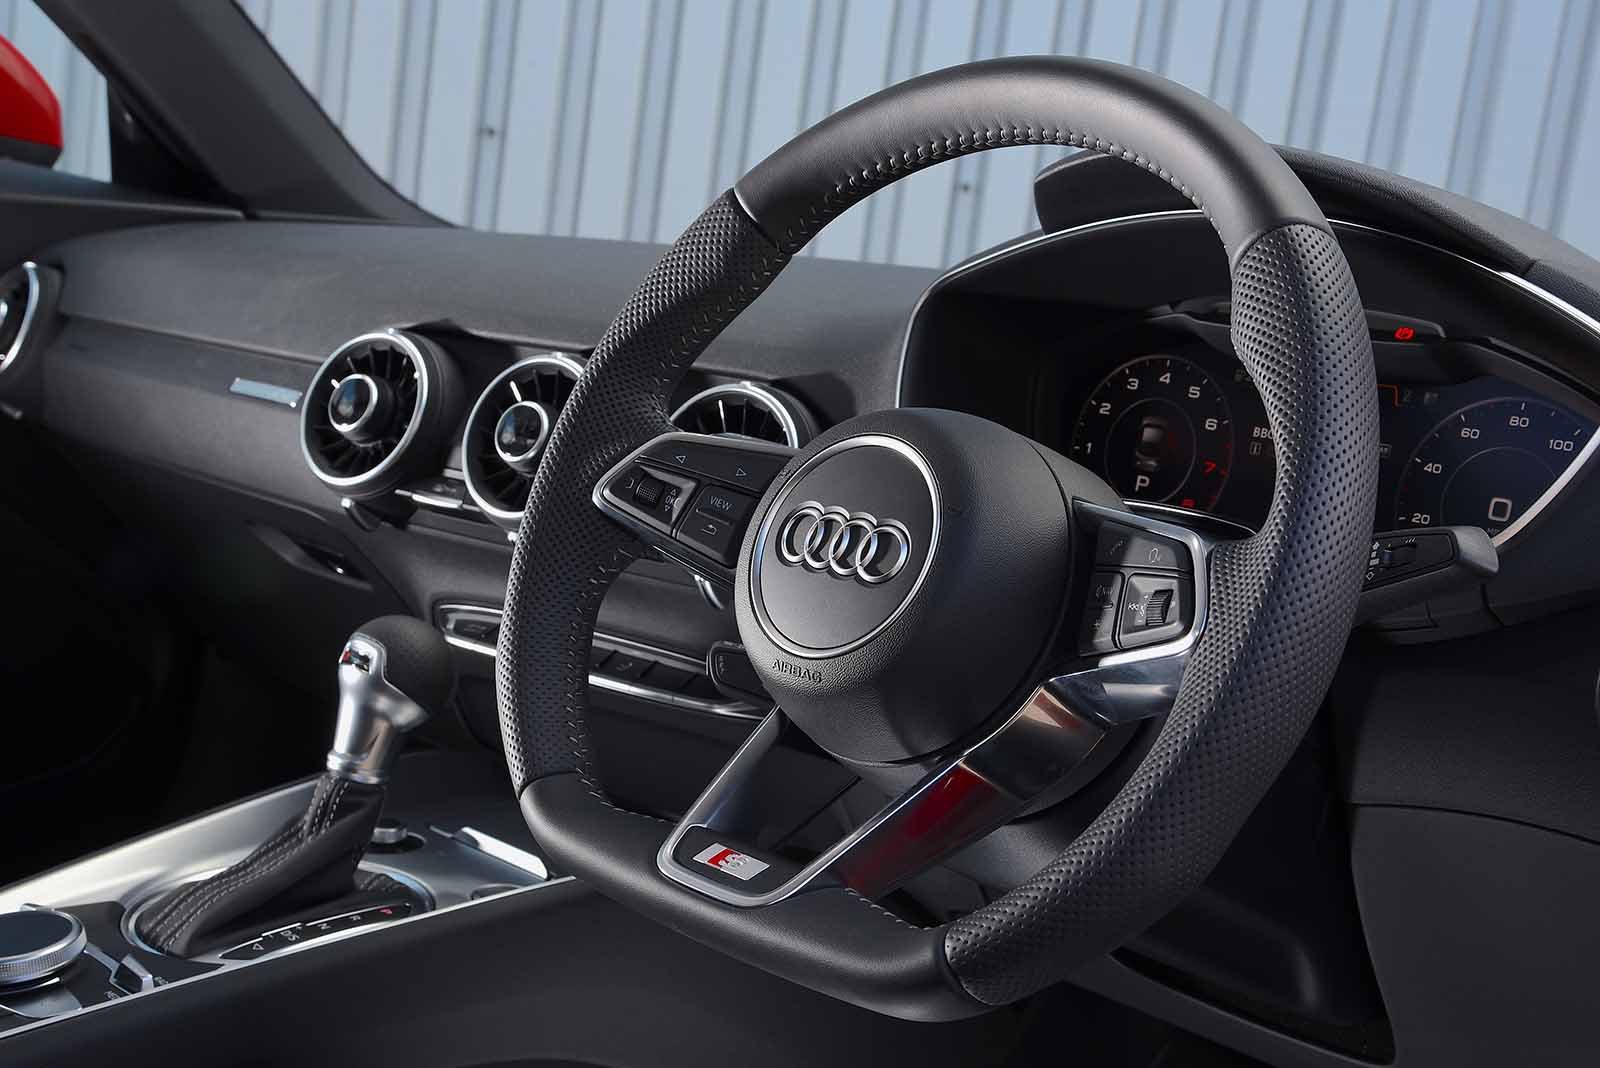 Audi TT Coupe 2019 RHD dashboard detail